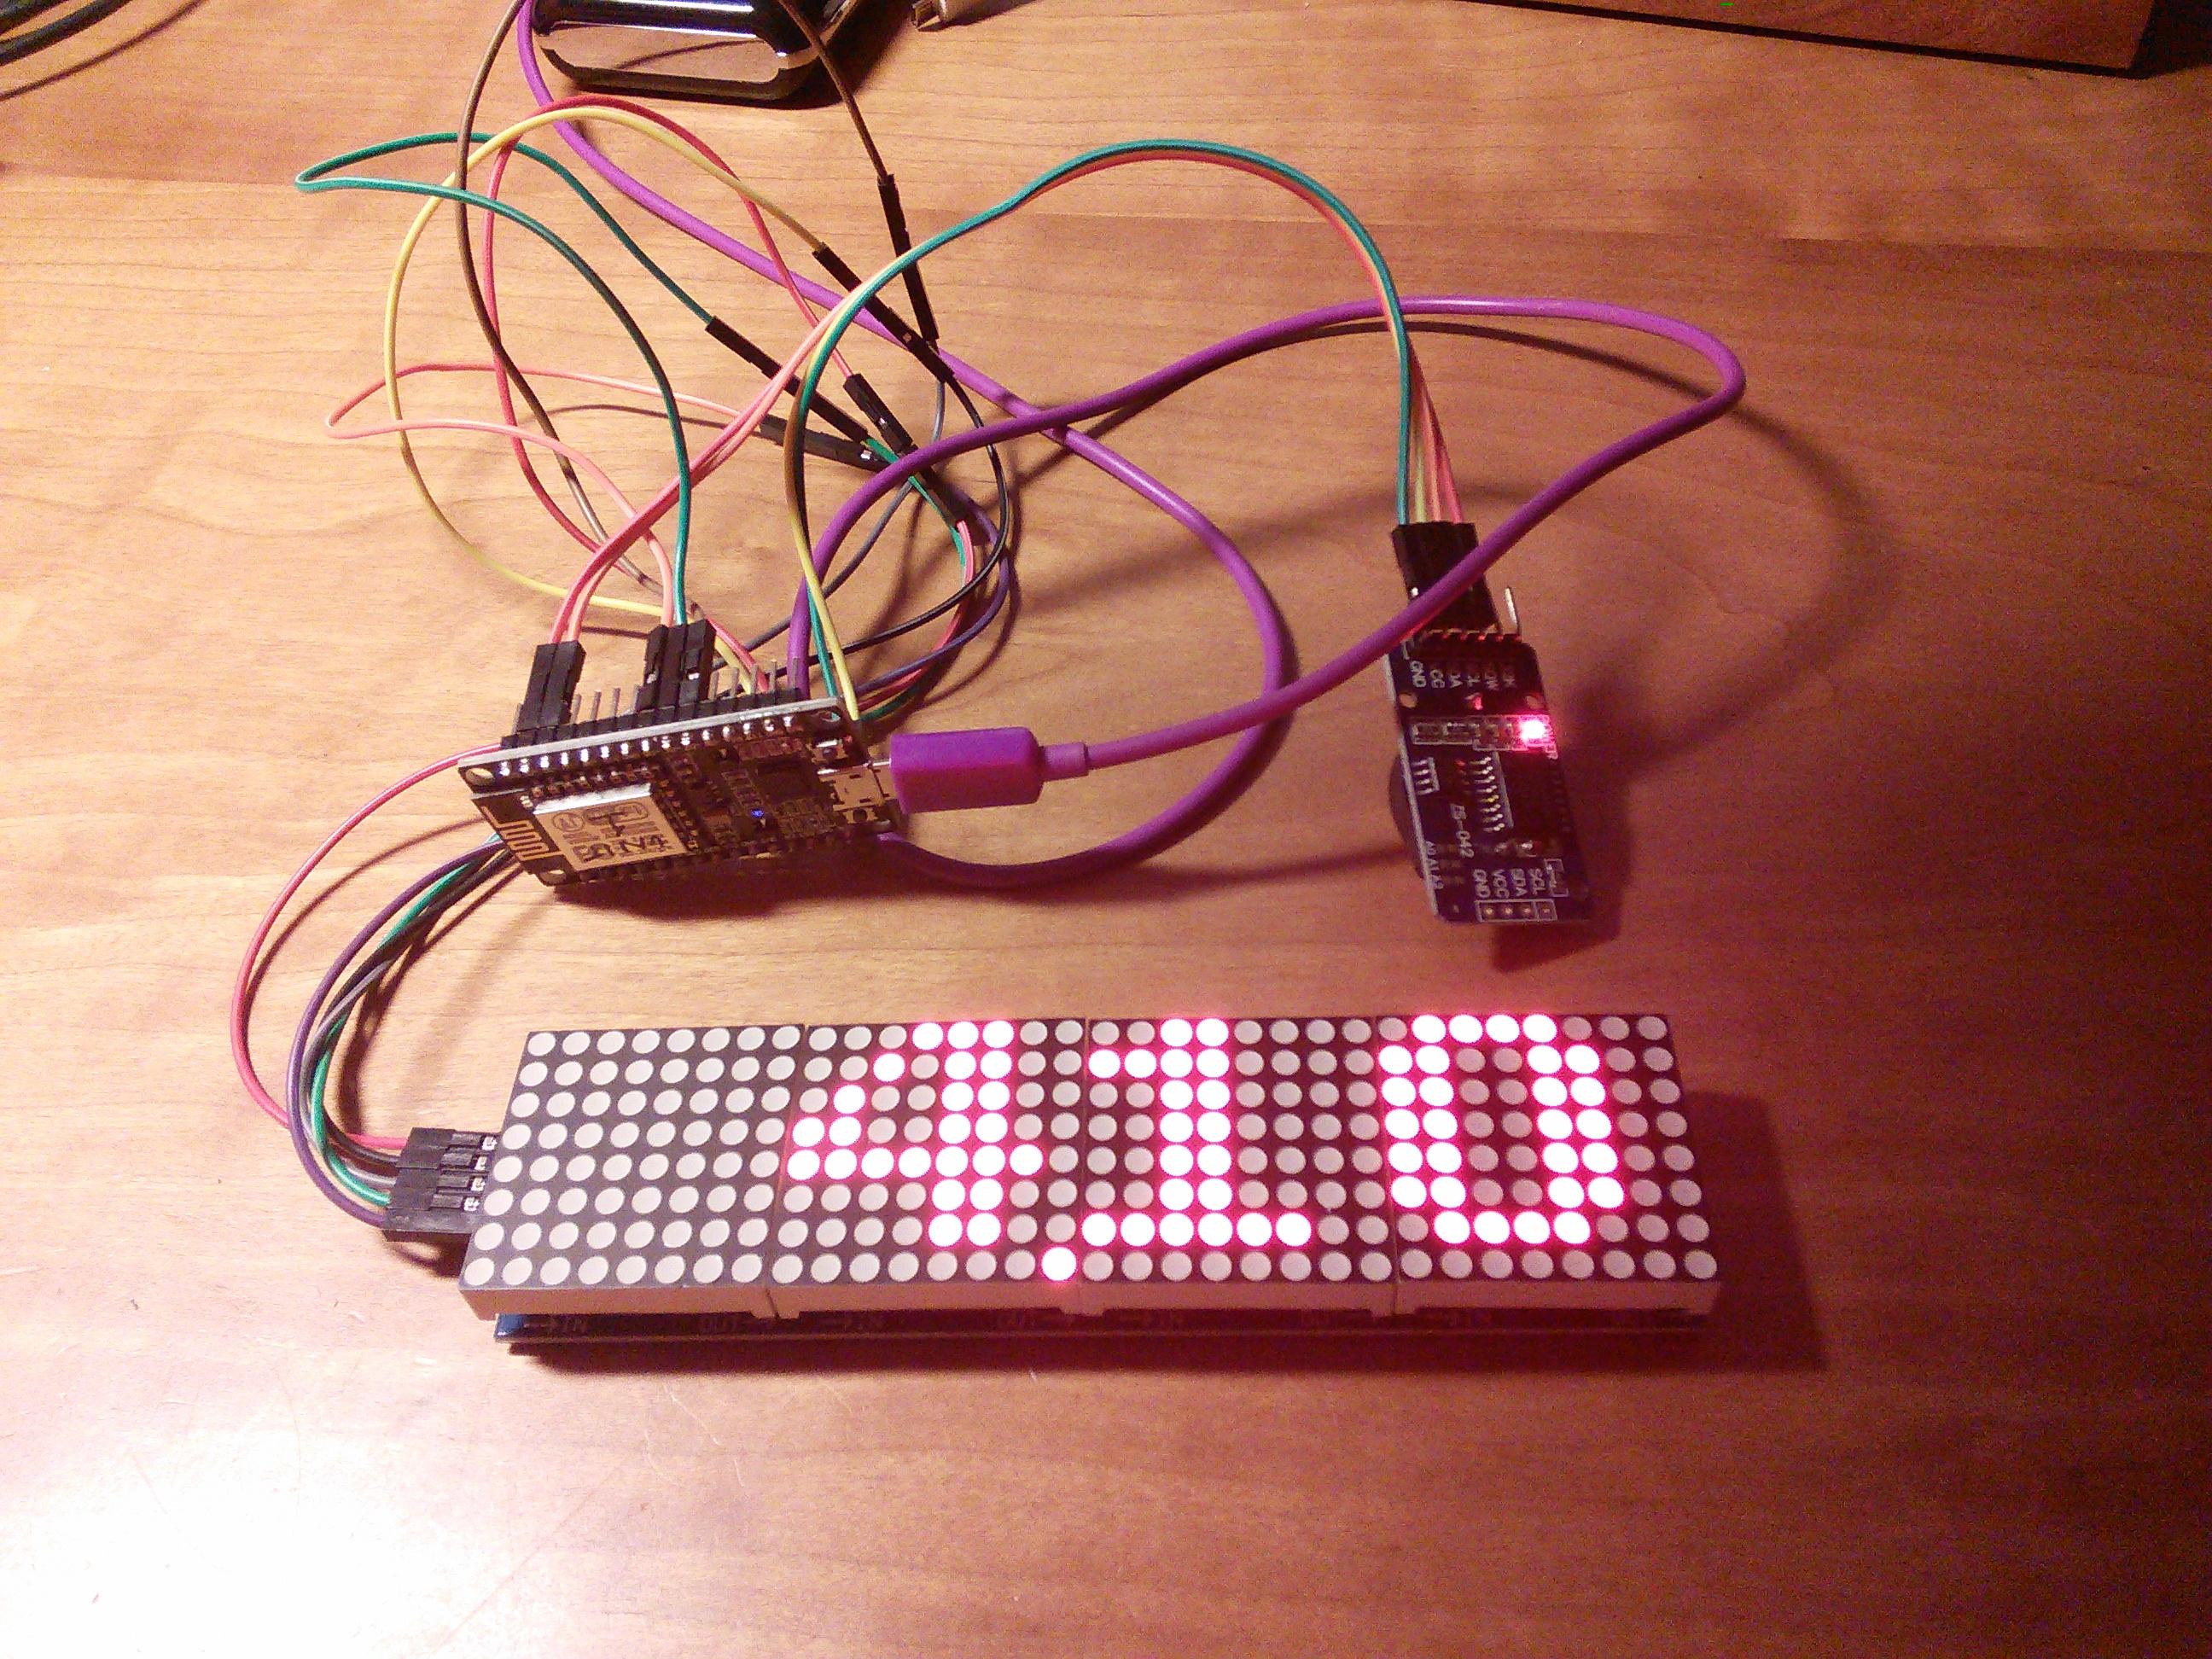 Picture of Simple Dot Matrix Clock Using Node MCU